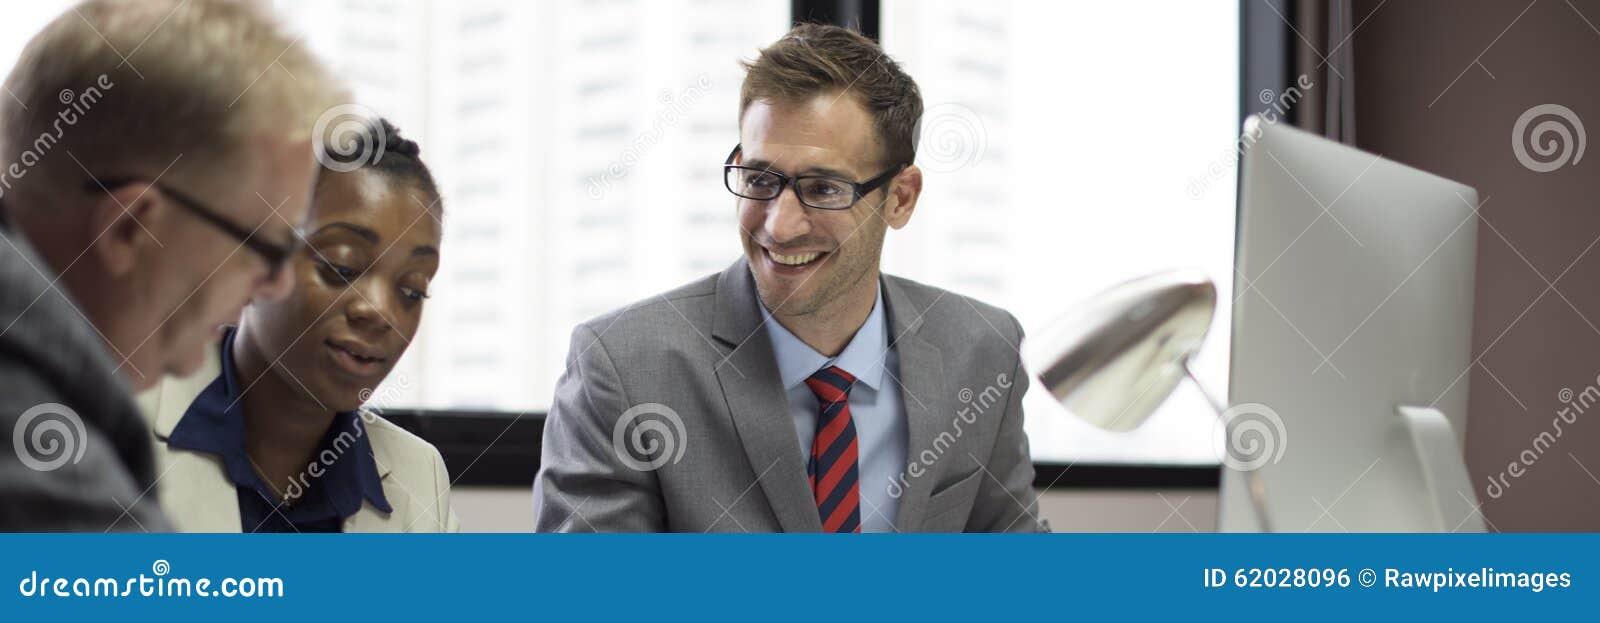 Affaires Team Corporate Organization Meeting Concept